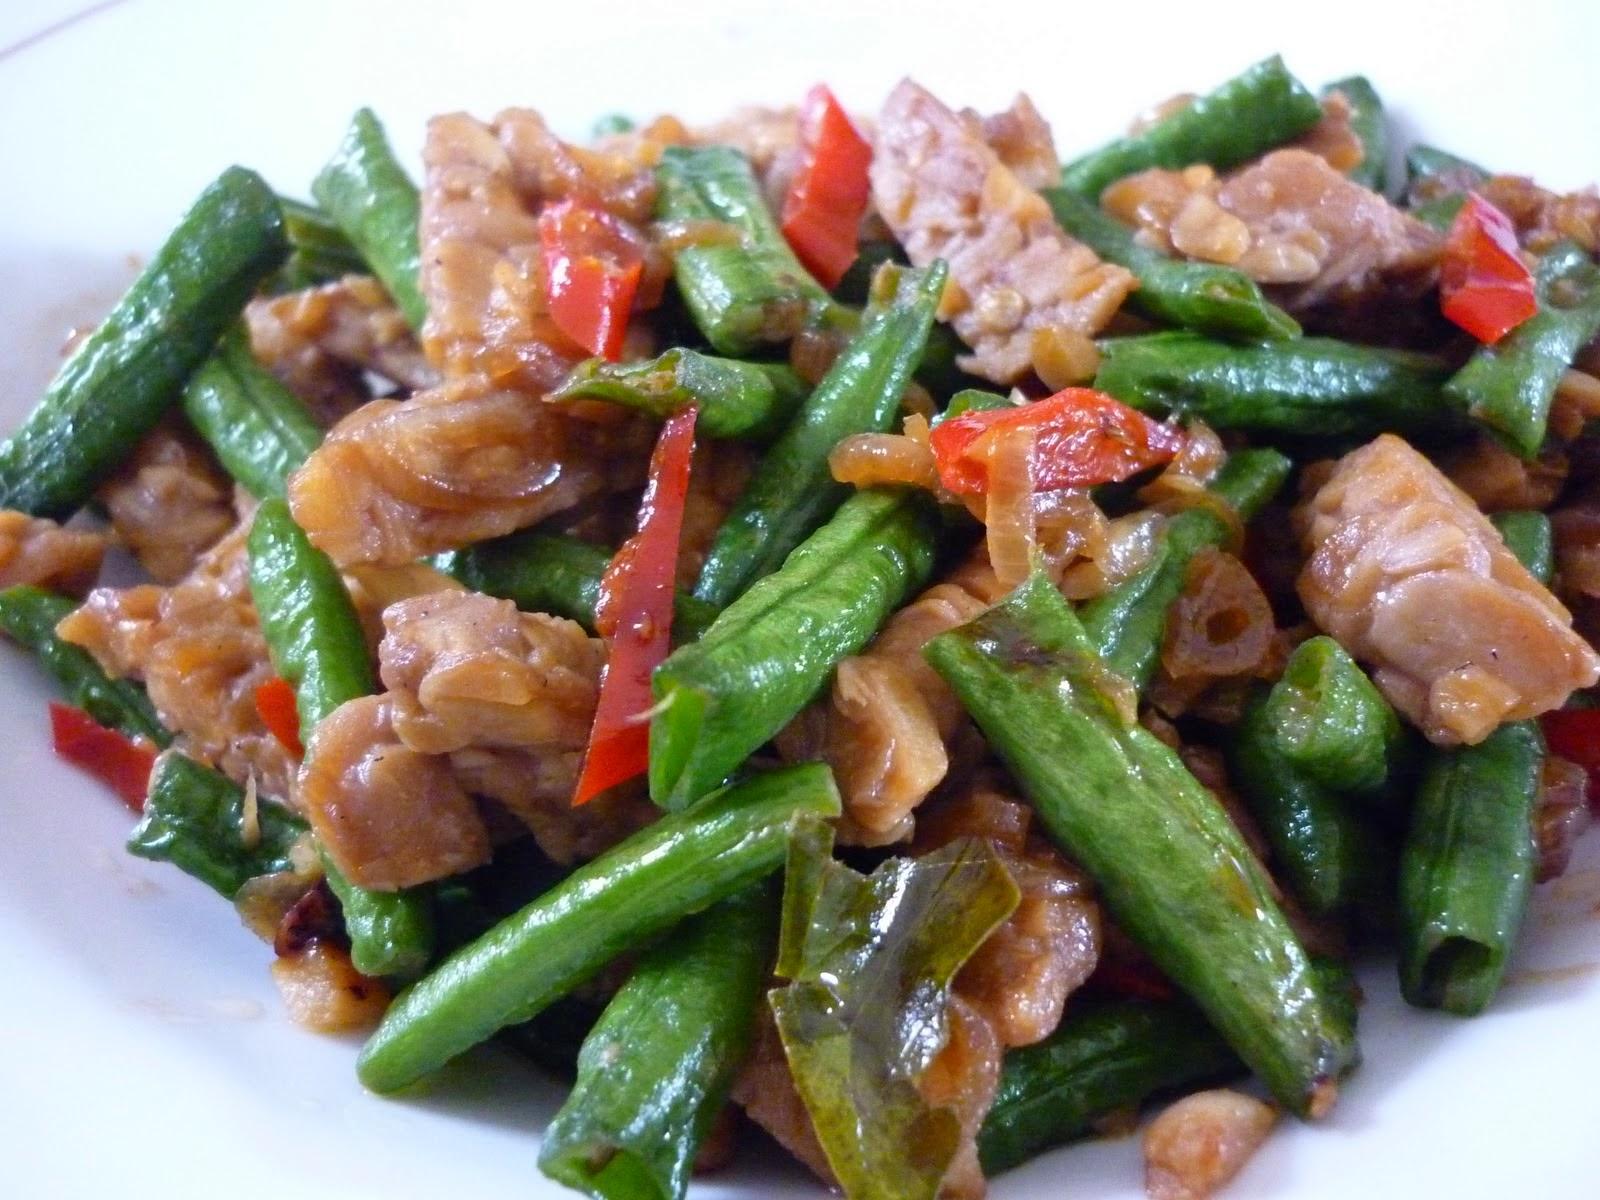 Resep masakan tumis kacang panjang dan tempe